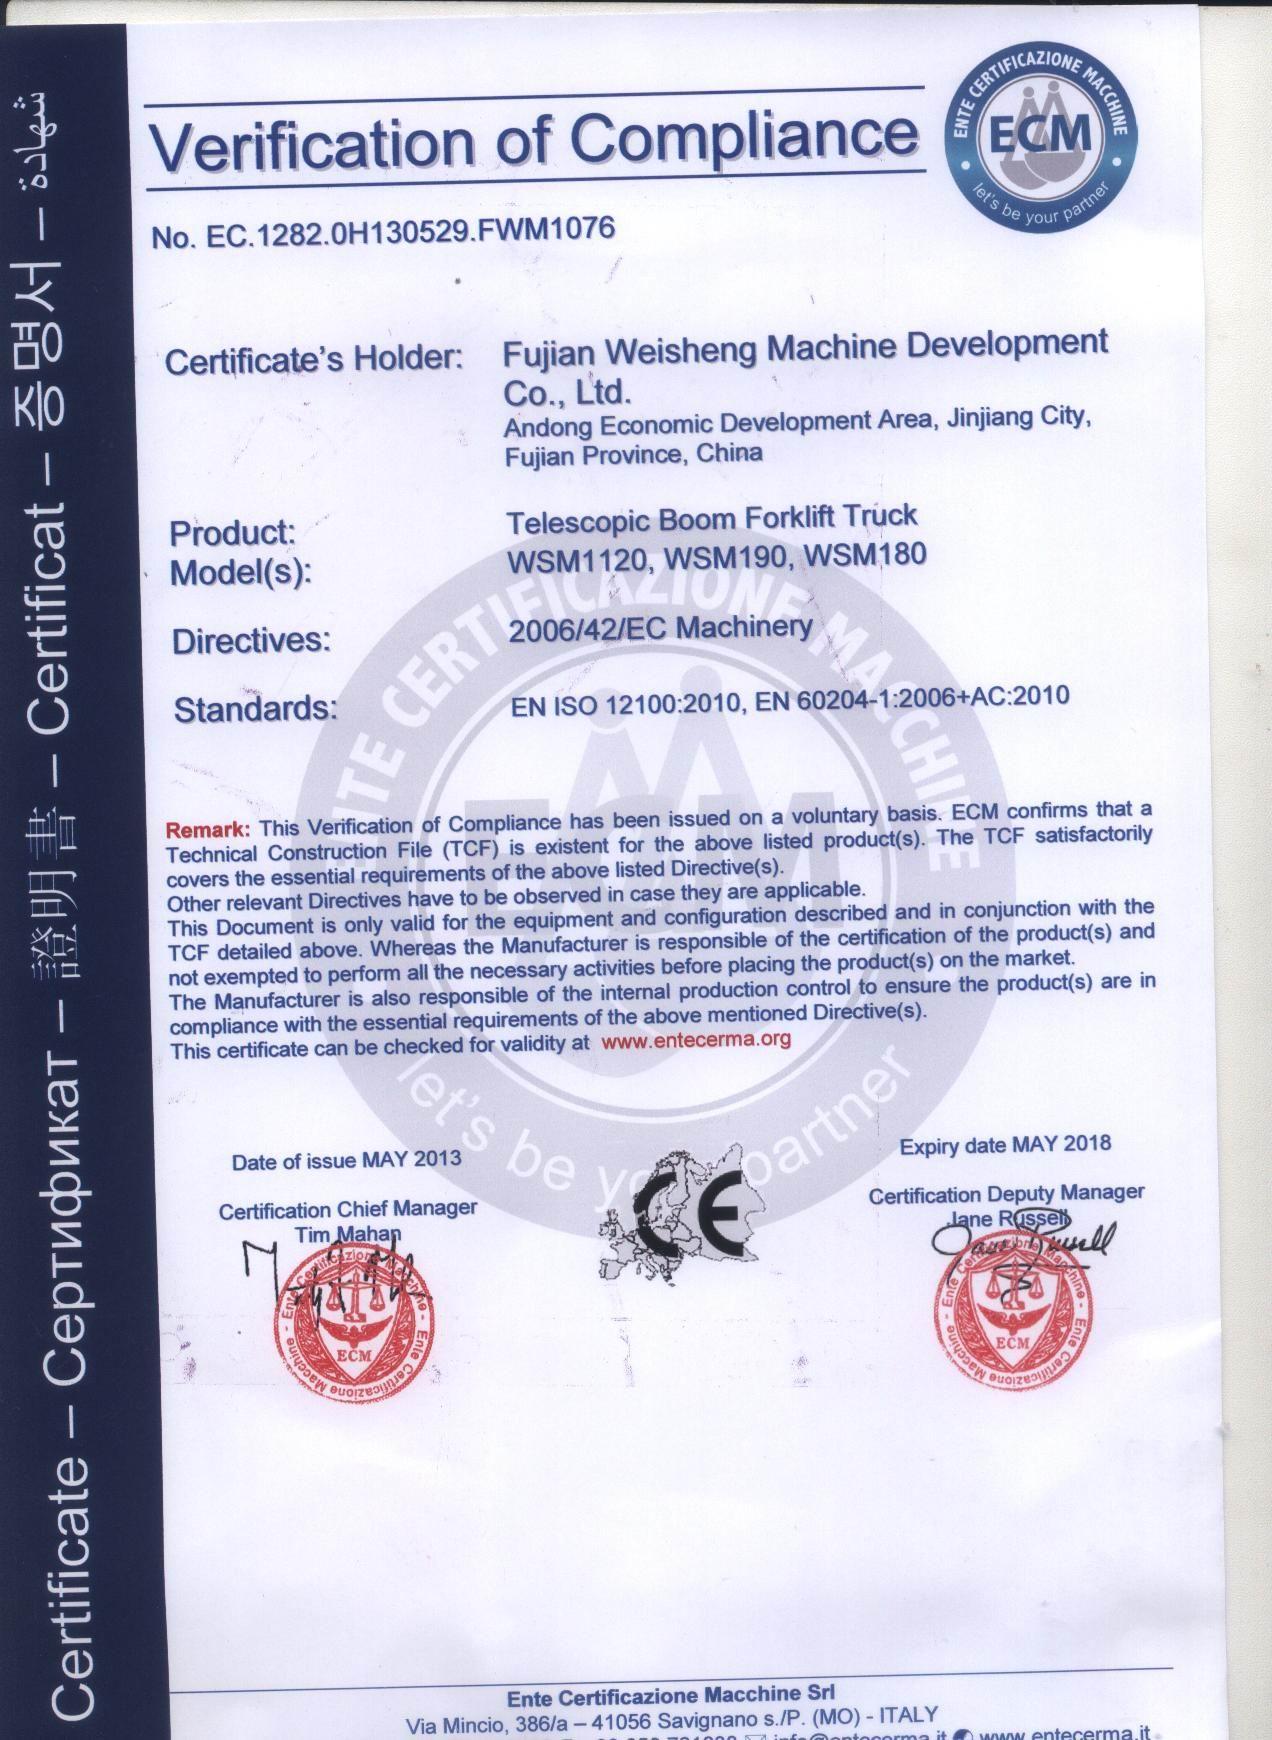 Telescopic Boom Forklift Truck CE certification